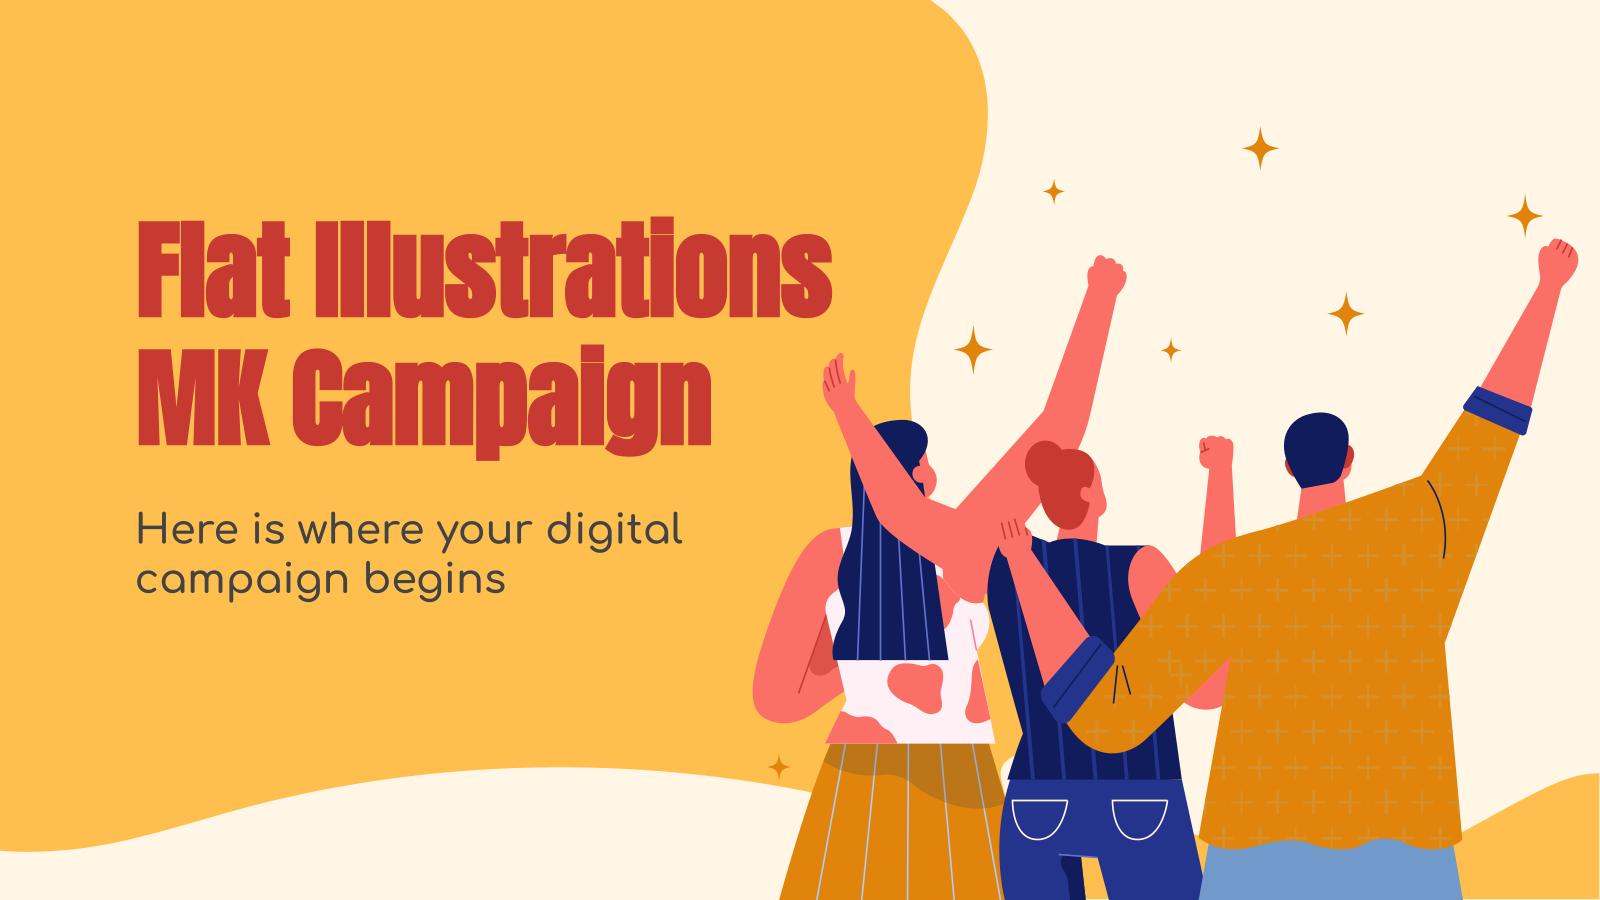 Flat Illustrations MK Campaign presentation template